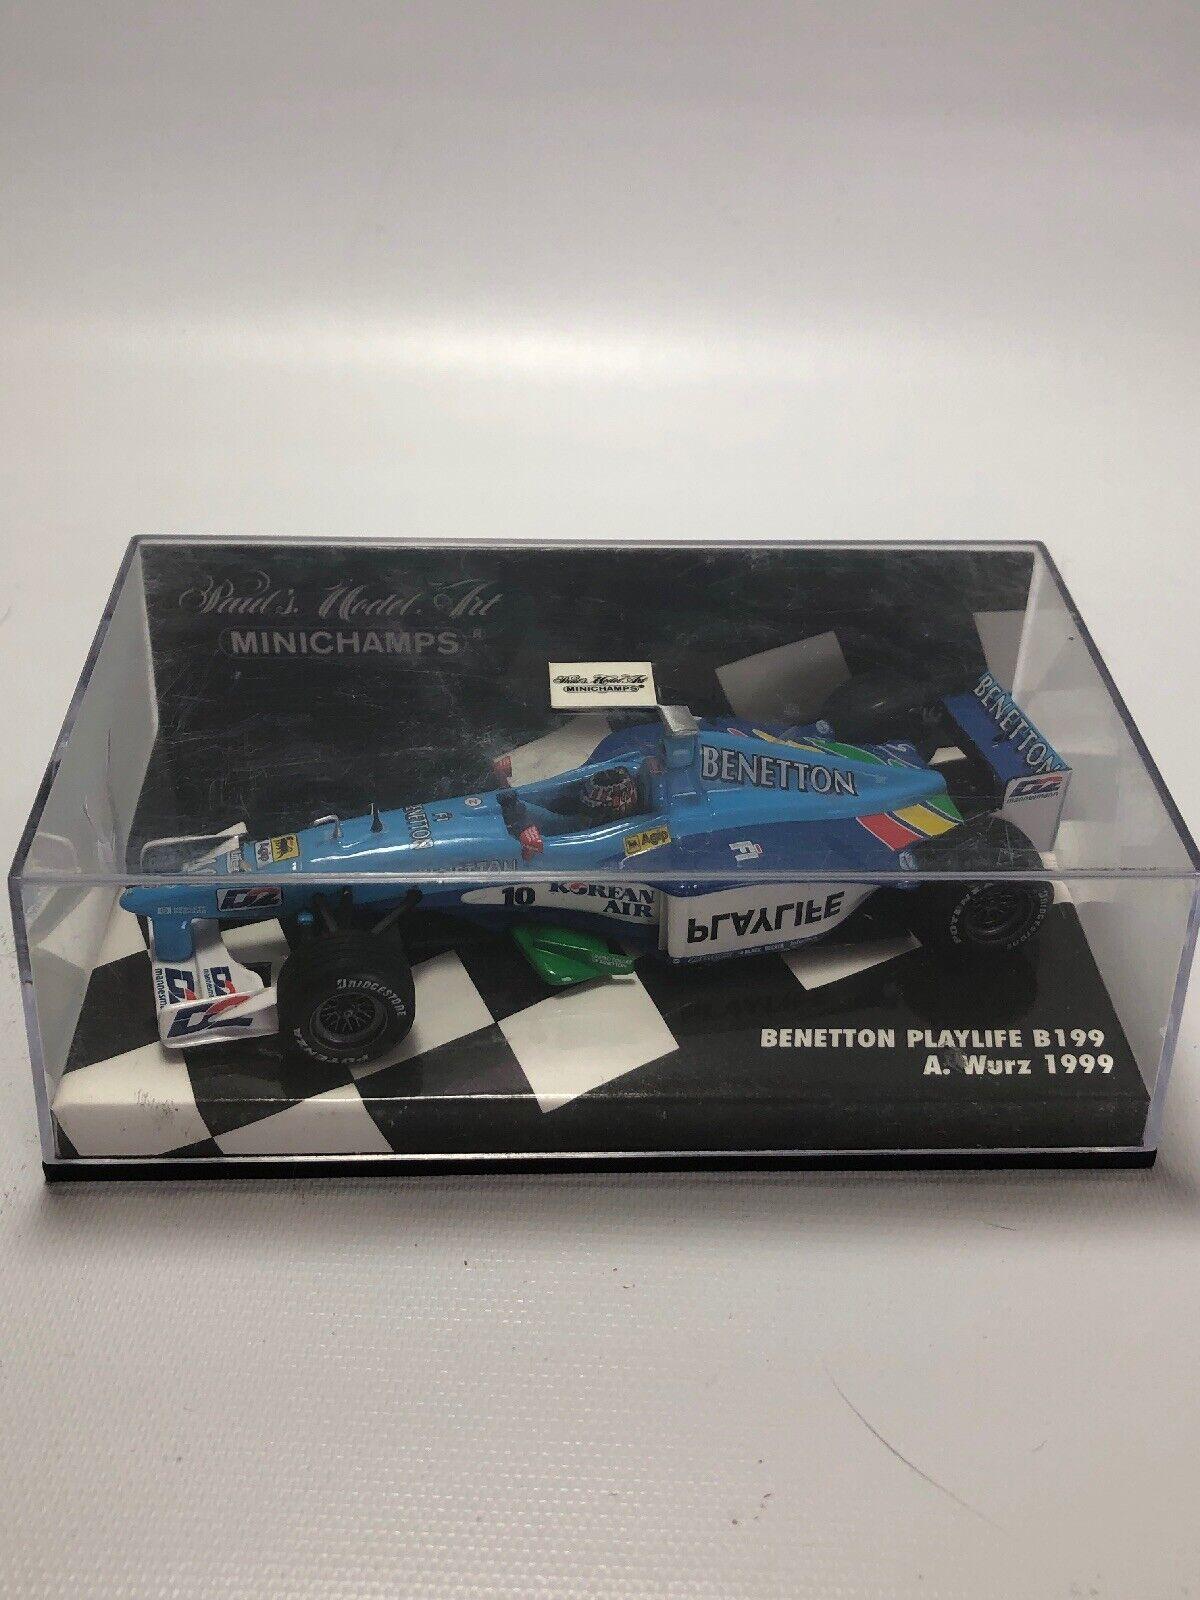 Pauls Model Art Mini Champs  Benetton Playlife B199 A Wurz 1999